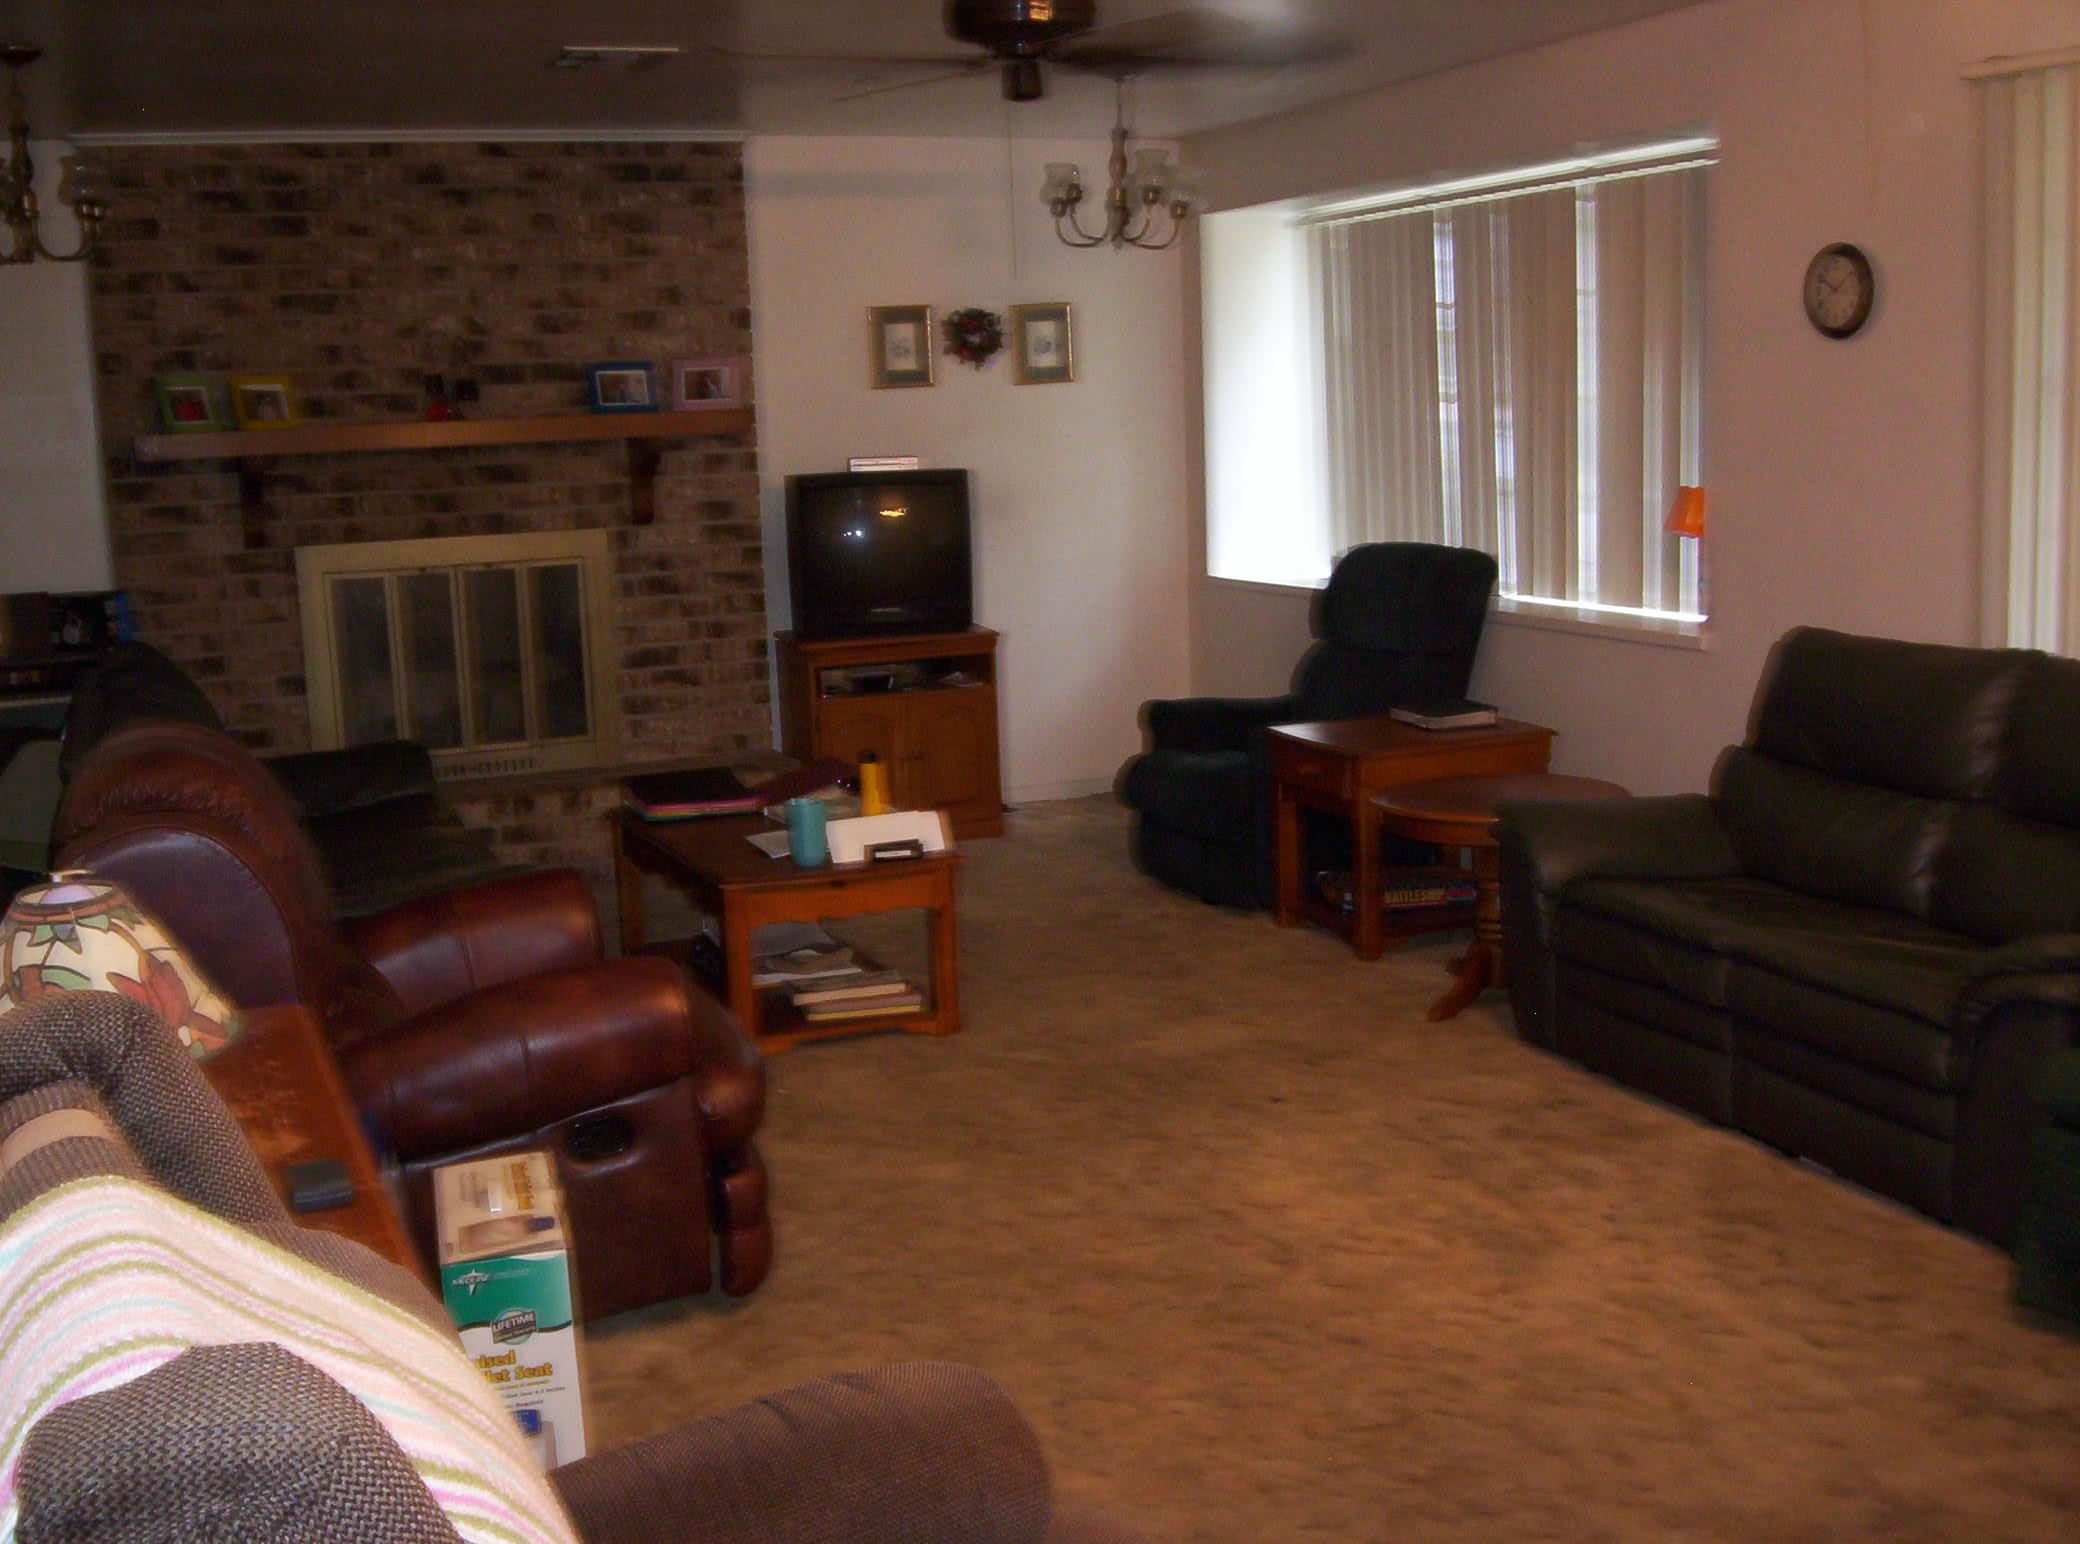 Provider Home1-LivingArea1.jpg